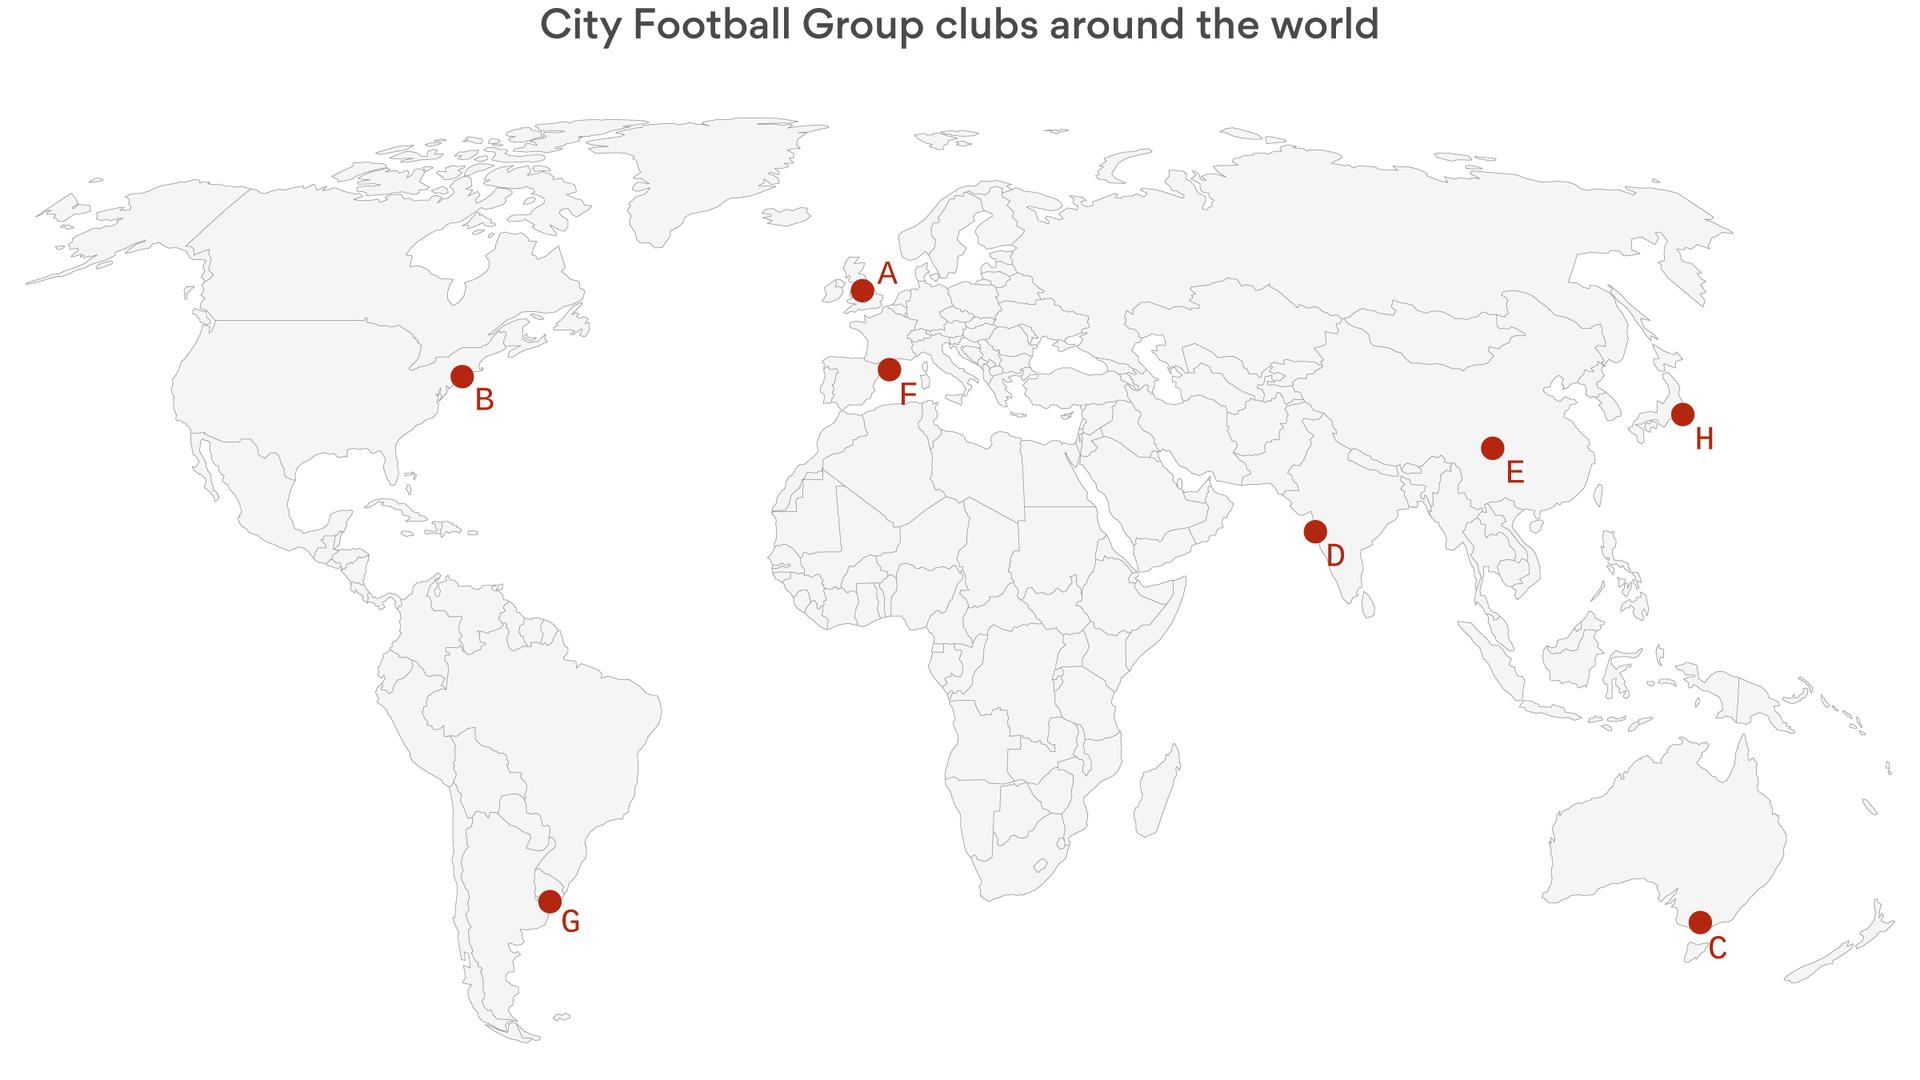 The City Football Group empire's worldwide reach